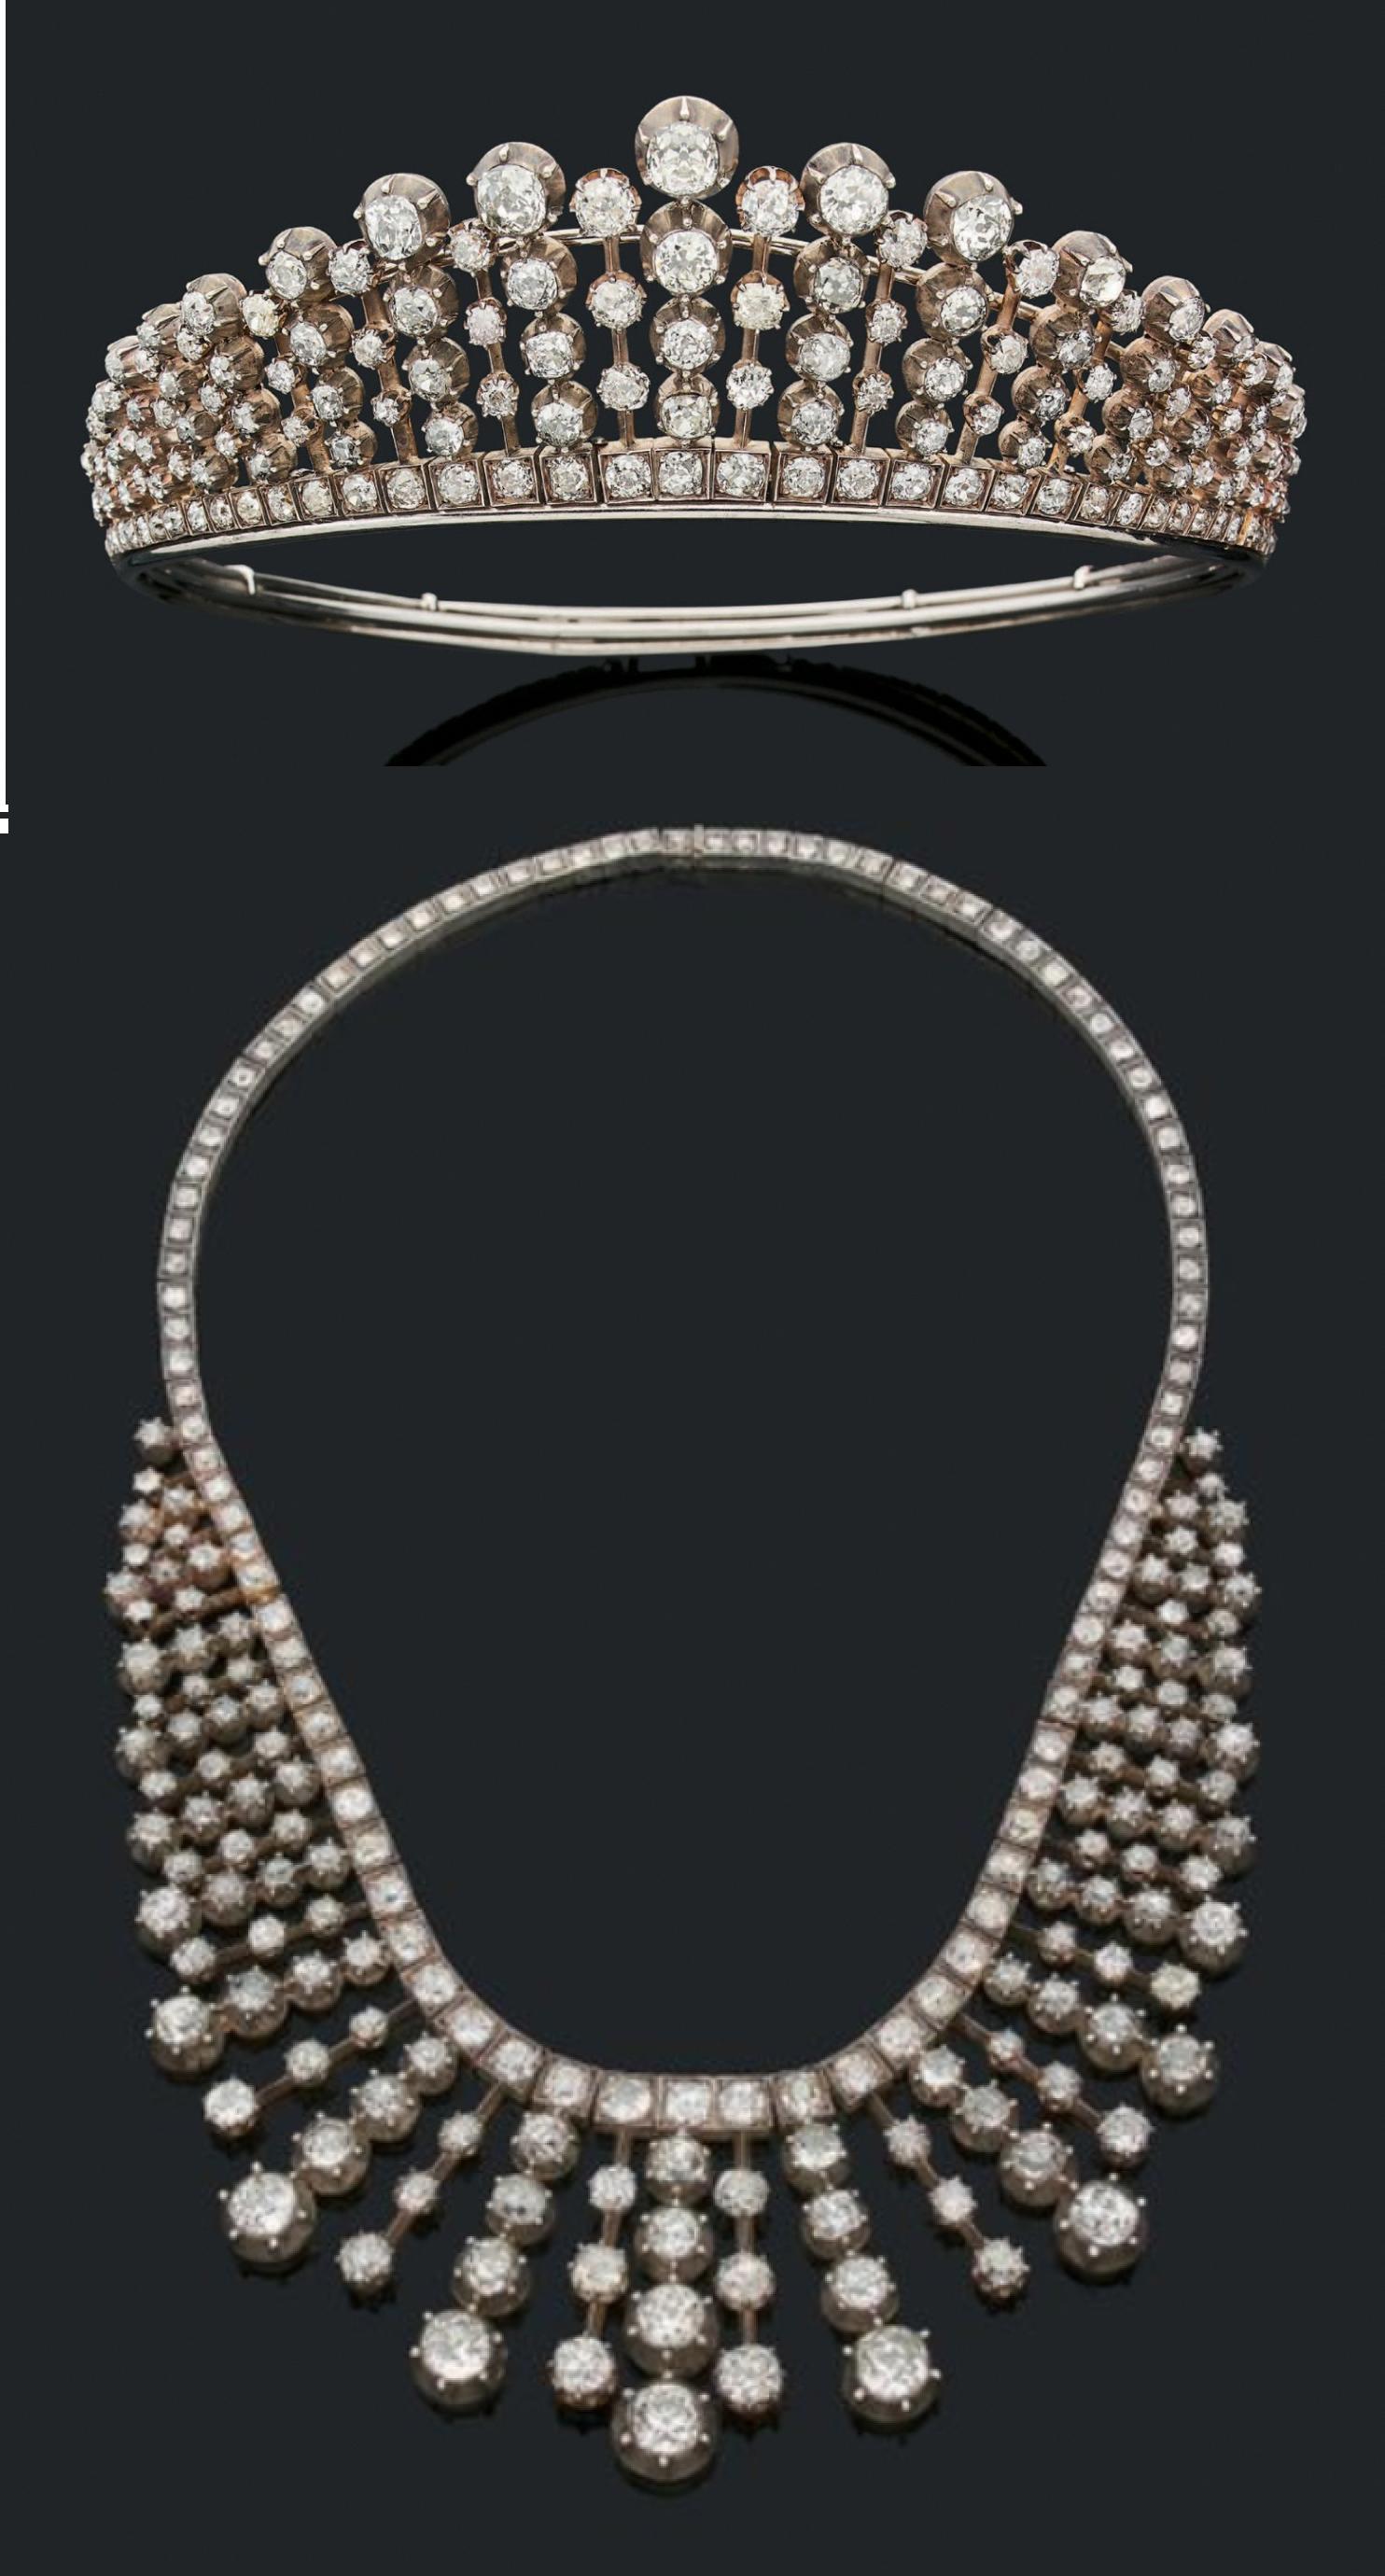 Jewelry Exchange Ca : jewelry, exchange, Jewelry, Exchange